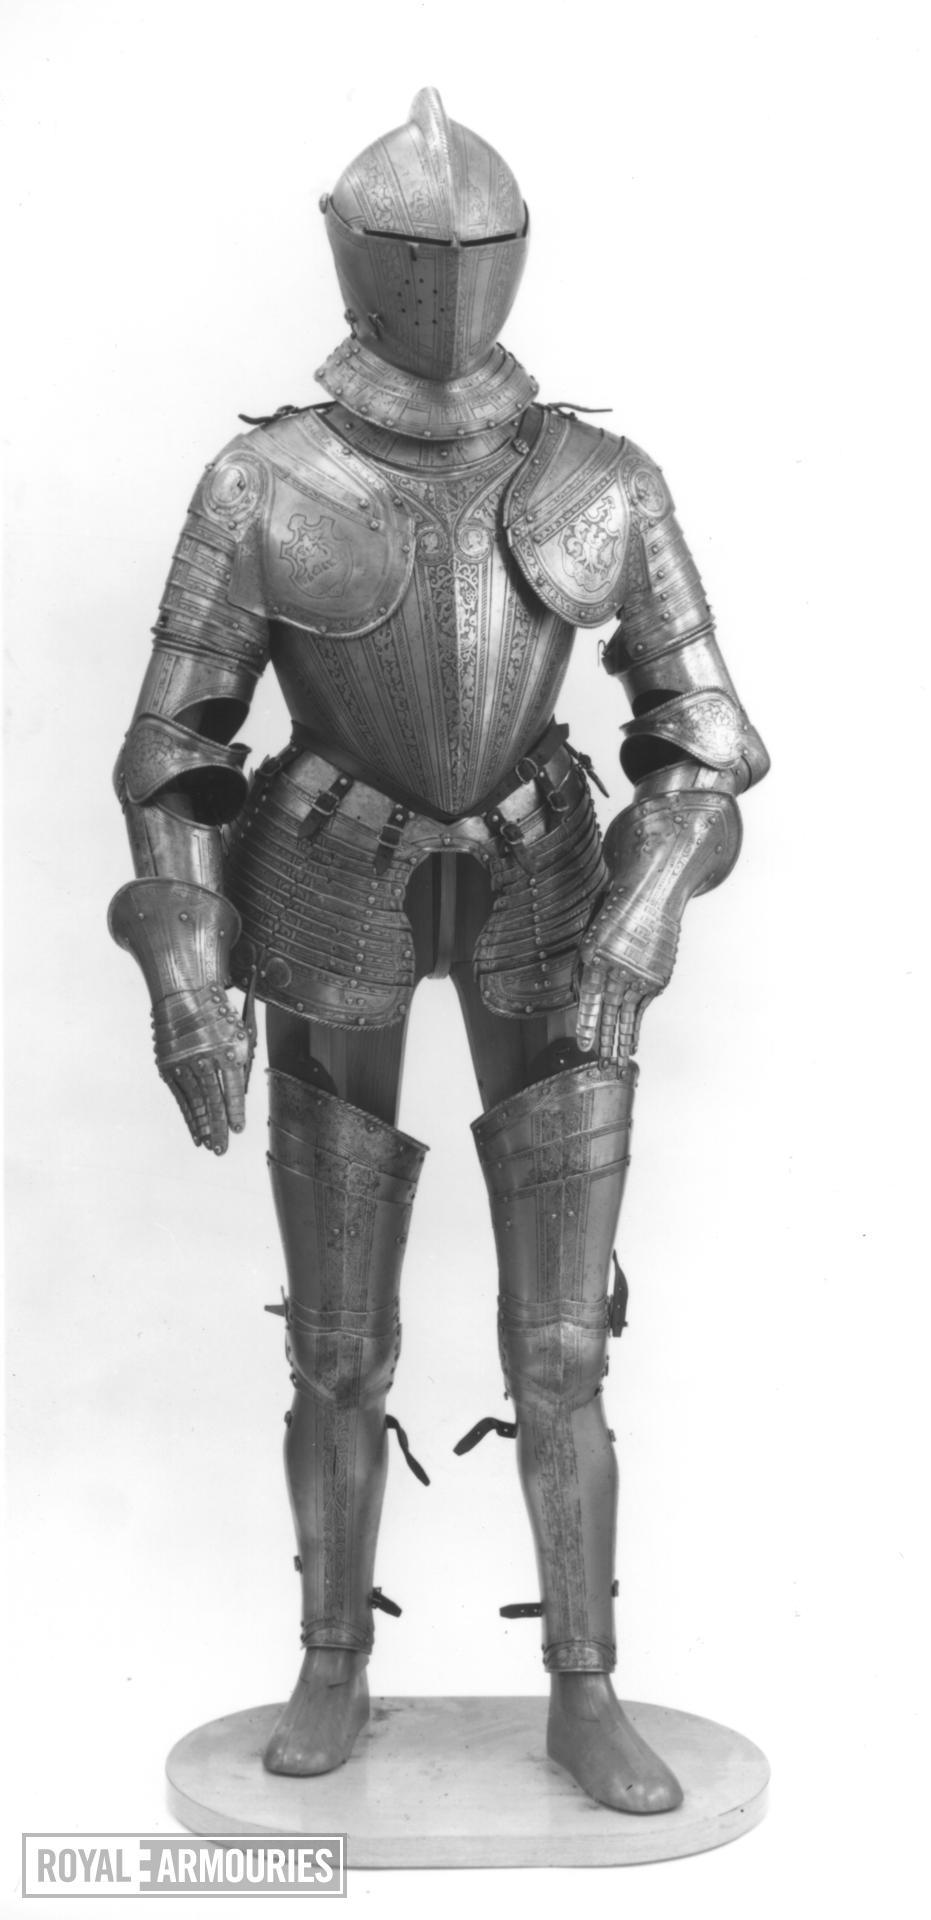 Field armour Composite armour